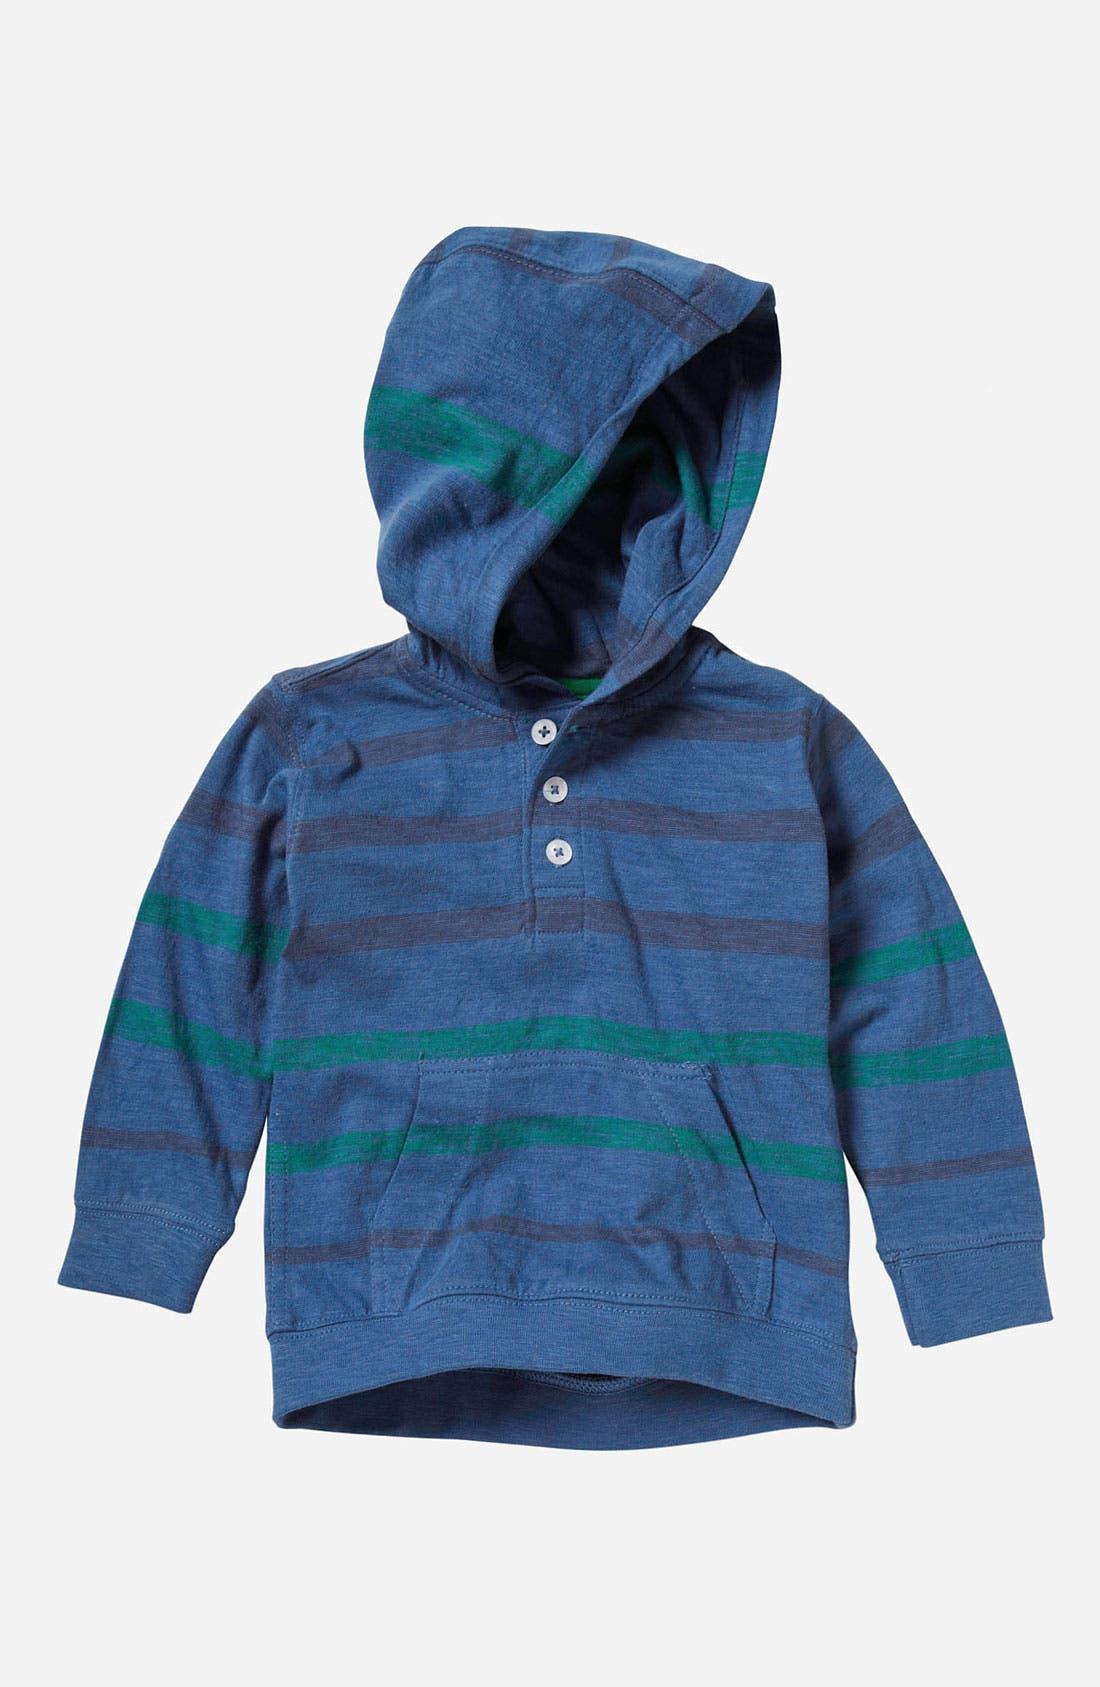 Alternate Image 1 Selected - Quiksilver 'Merz' Hooded Henley Top (Infant)